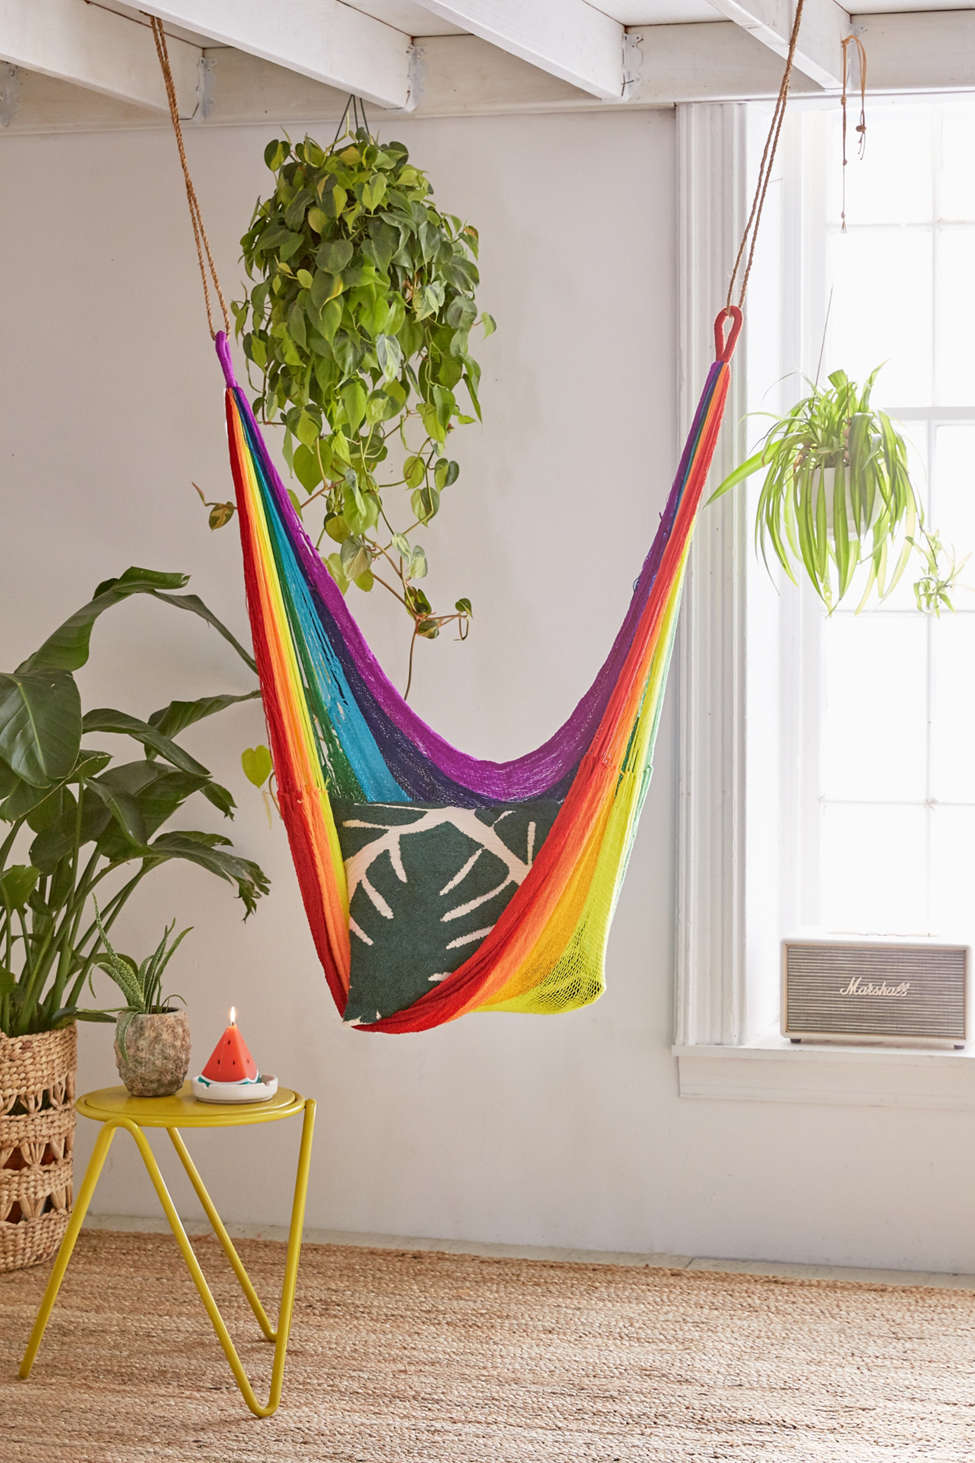 Slide View: 1: Yellow Leaf Rainbow Hammock Chair